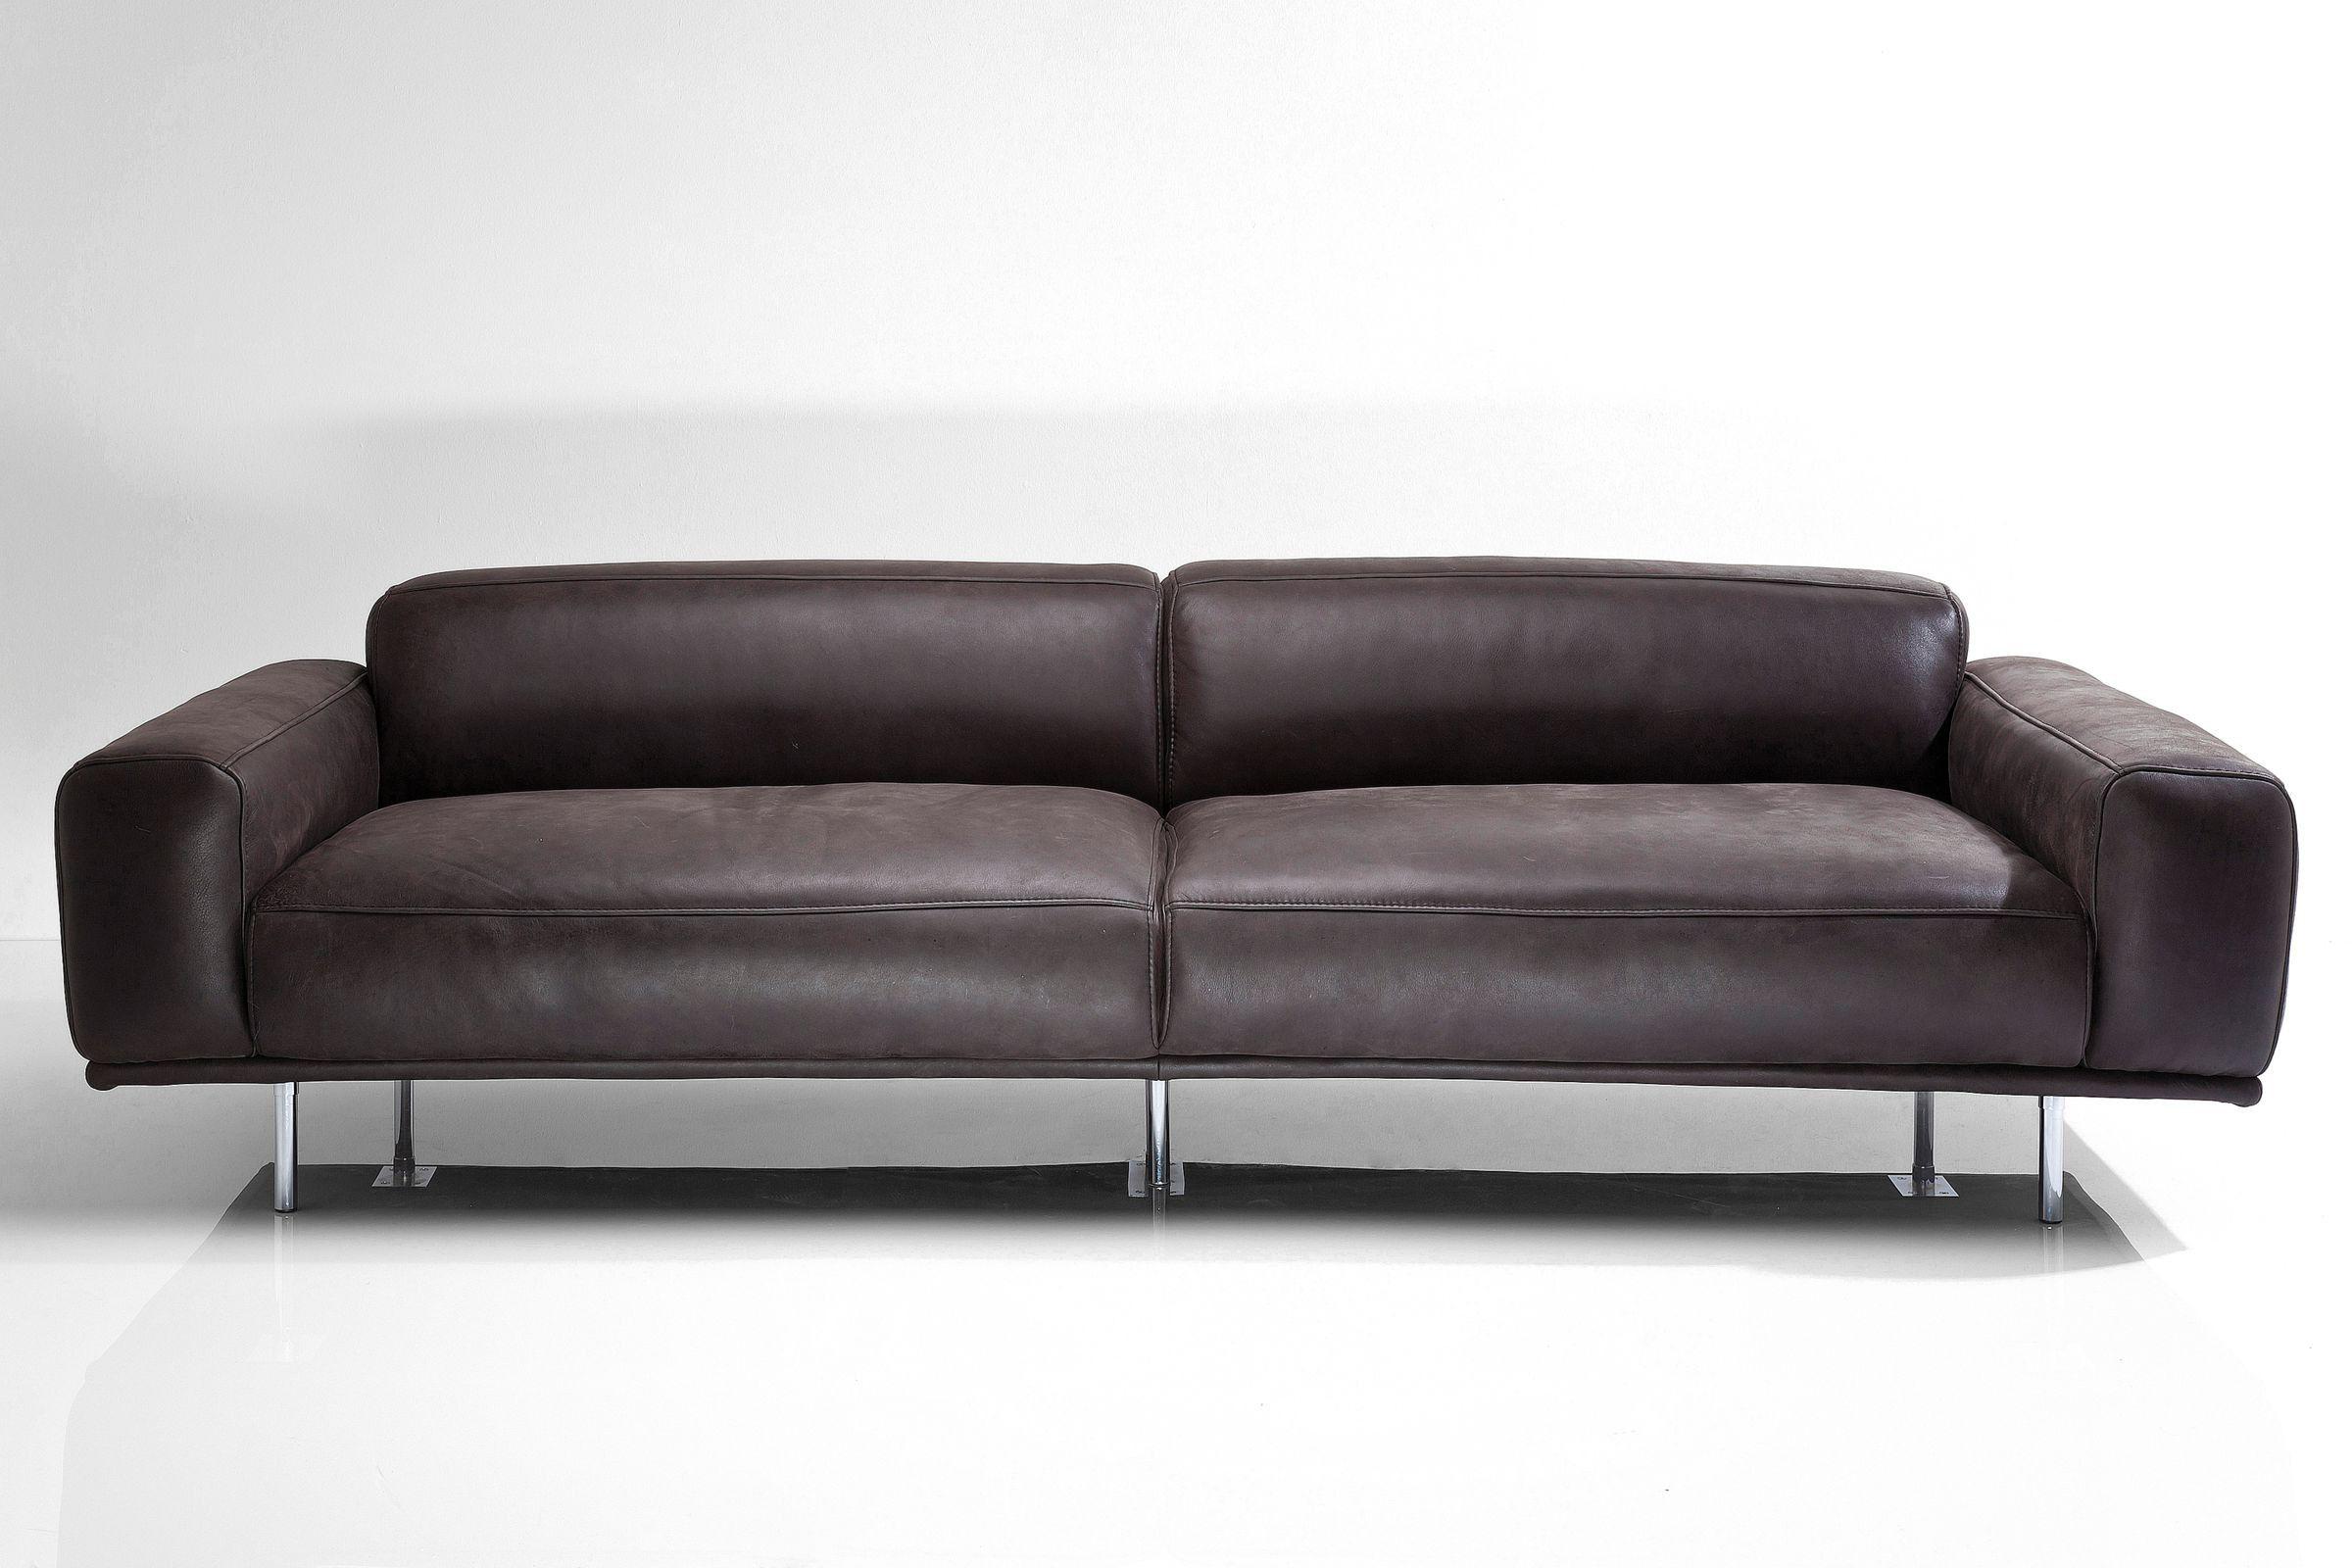 Sofa Lorenzo 245cm Leder anthrazit by Kare Design/Studio ...